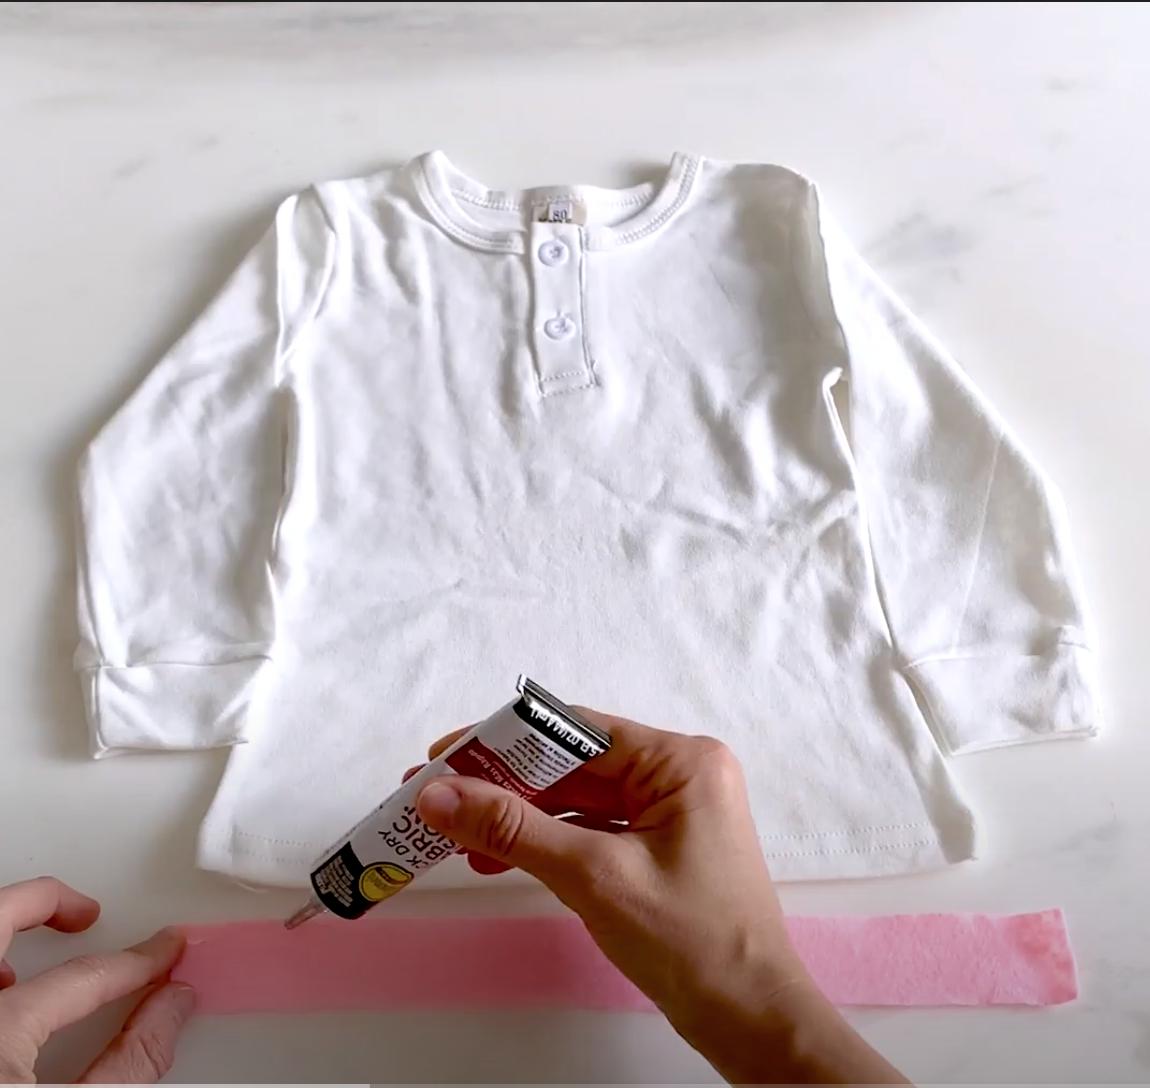 Cut strips of felt and glue onto shirt